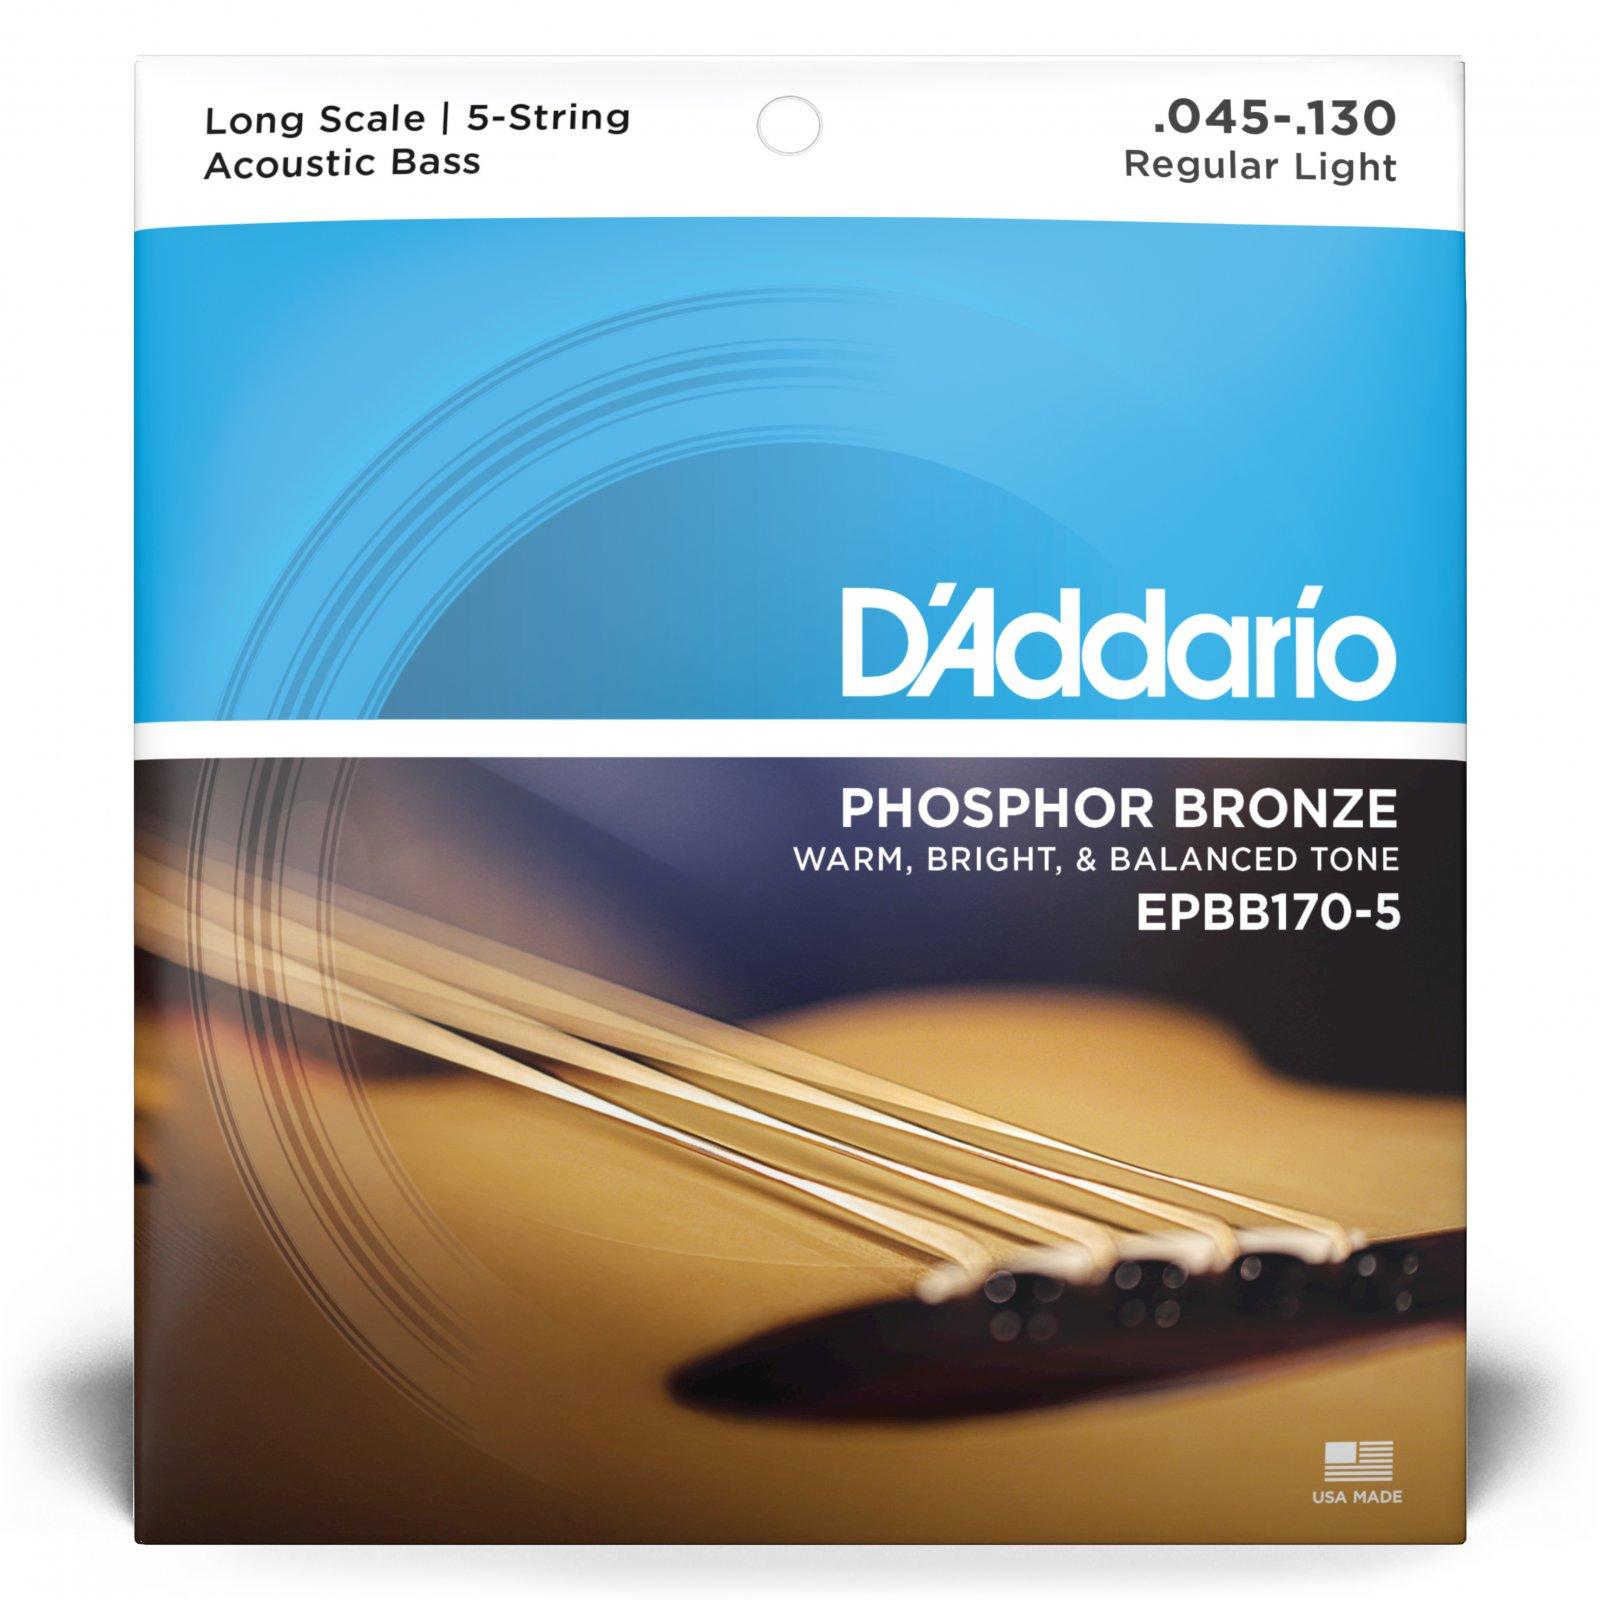 D'Addario EPBB170-5 Phosphor Bronze Acoustic Bass Strings Long Scale 5-String .045-.130